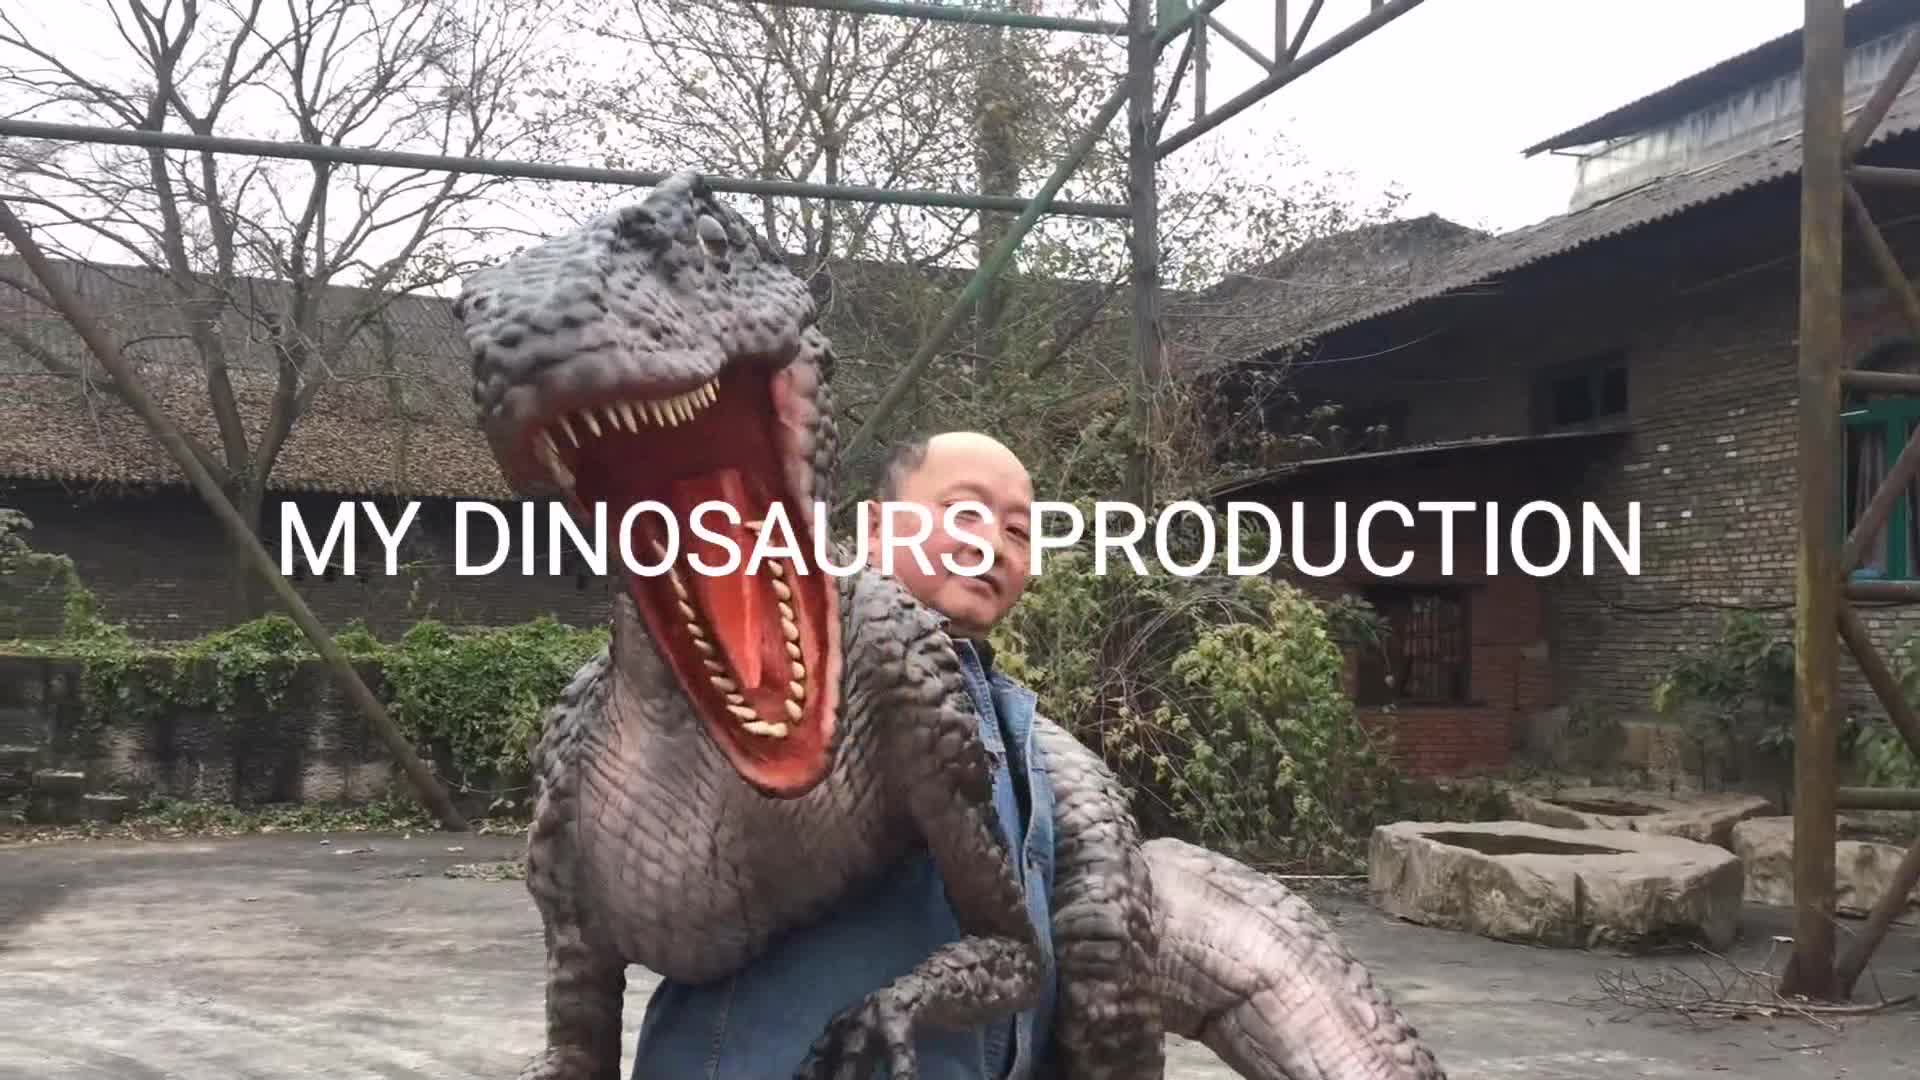 Benim Dino DP034 yürüyüş dinozor kukla kauçuk kostüm çocuklar dinozor kostüm